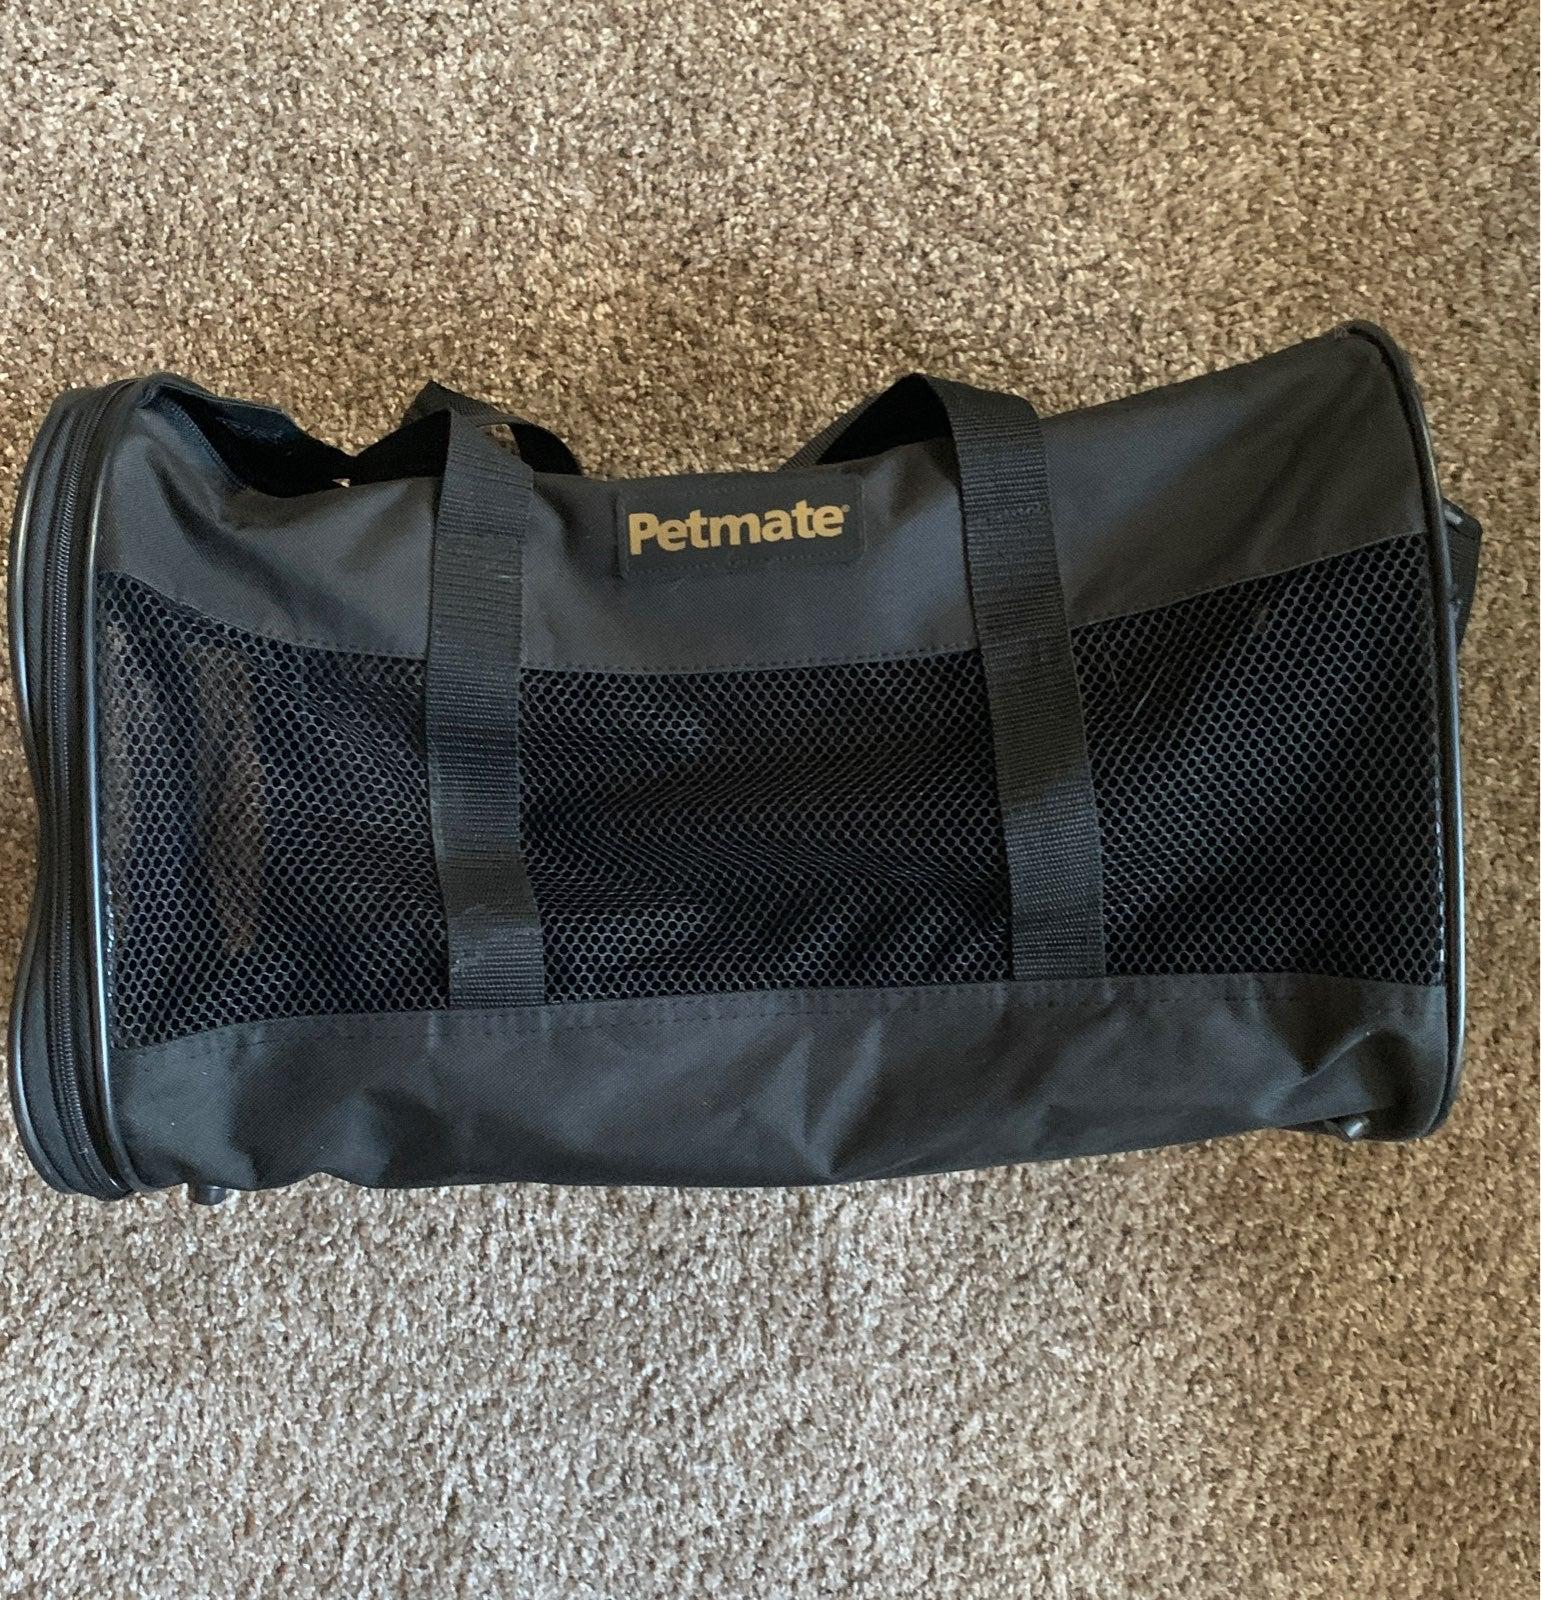 Petmate small pet carrier bag